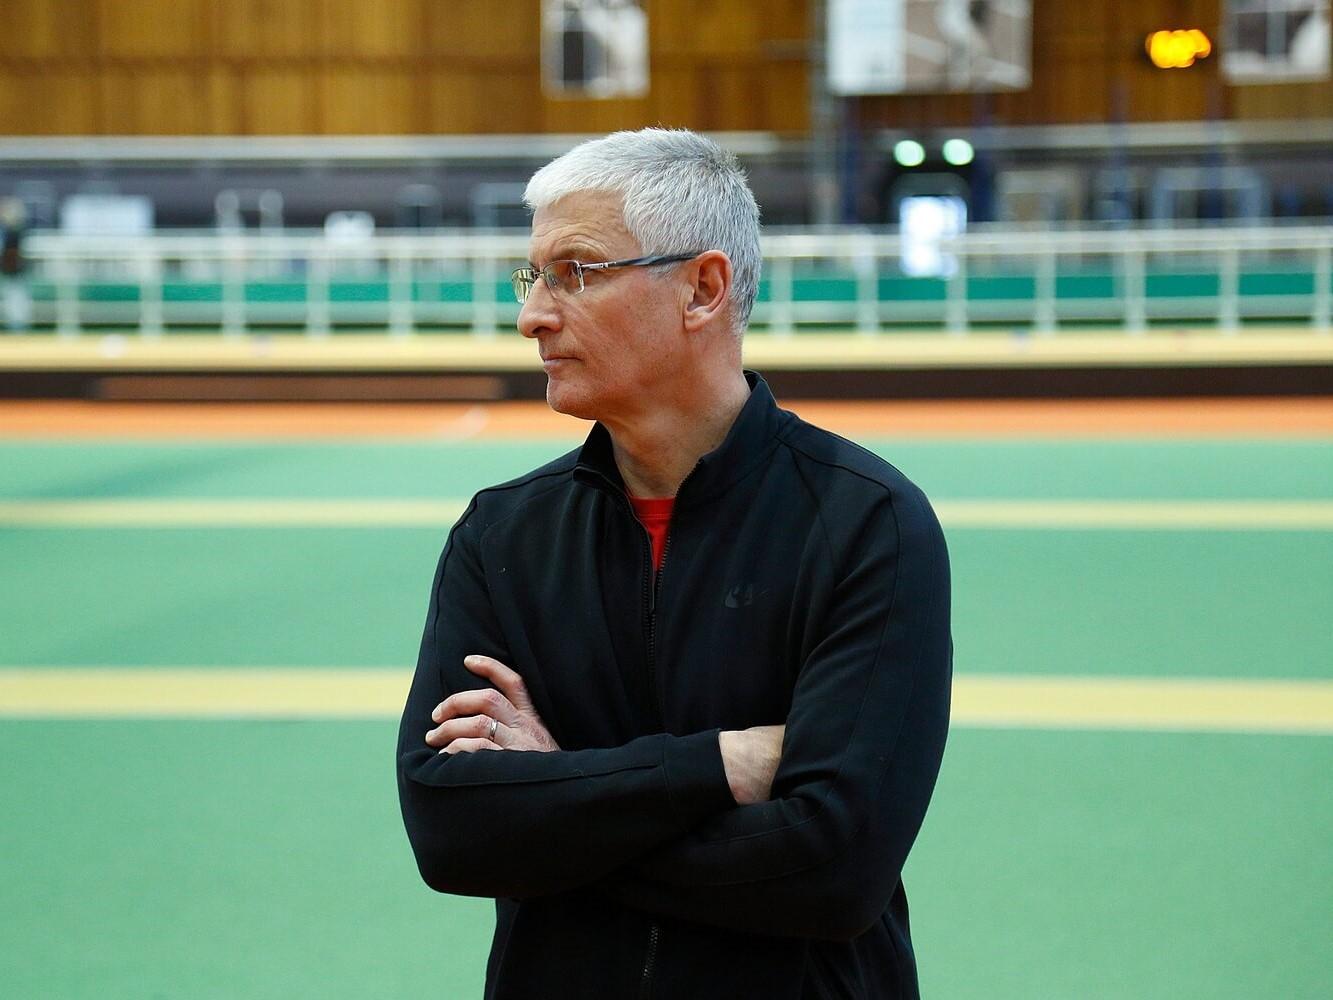 WeChamp Guy Ontanon Athlétisme